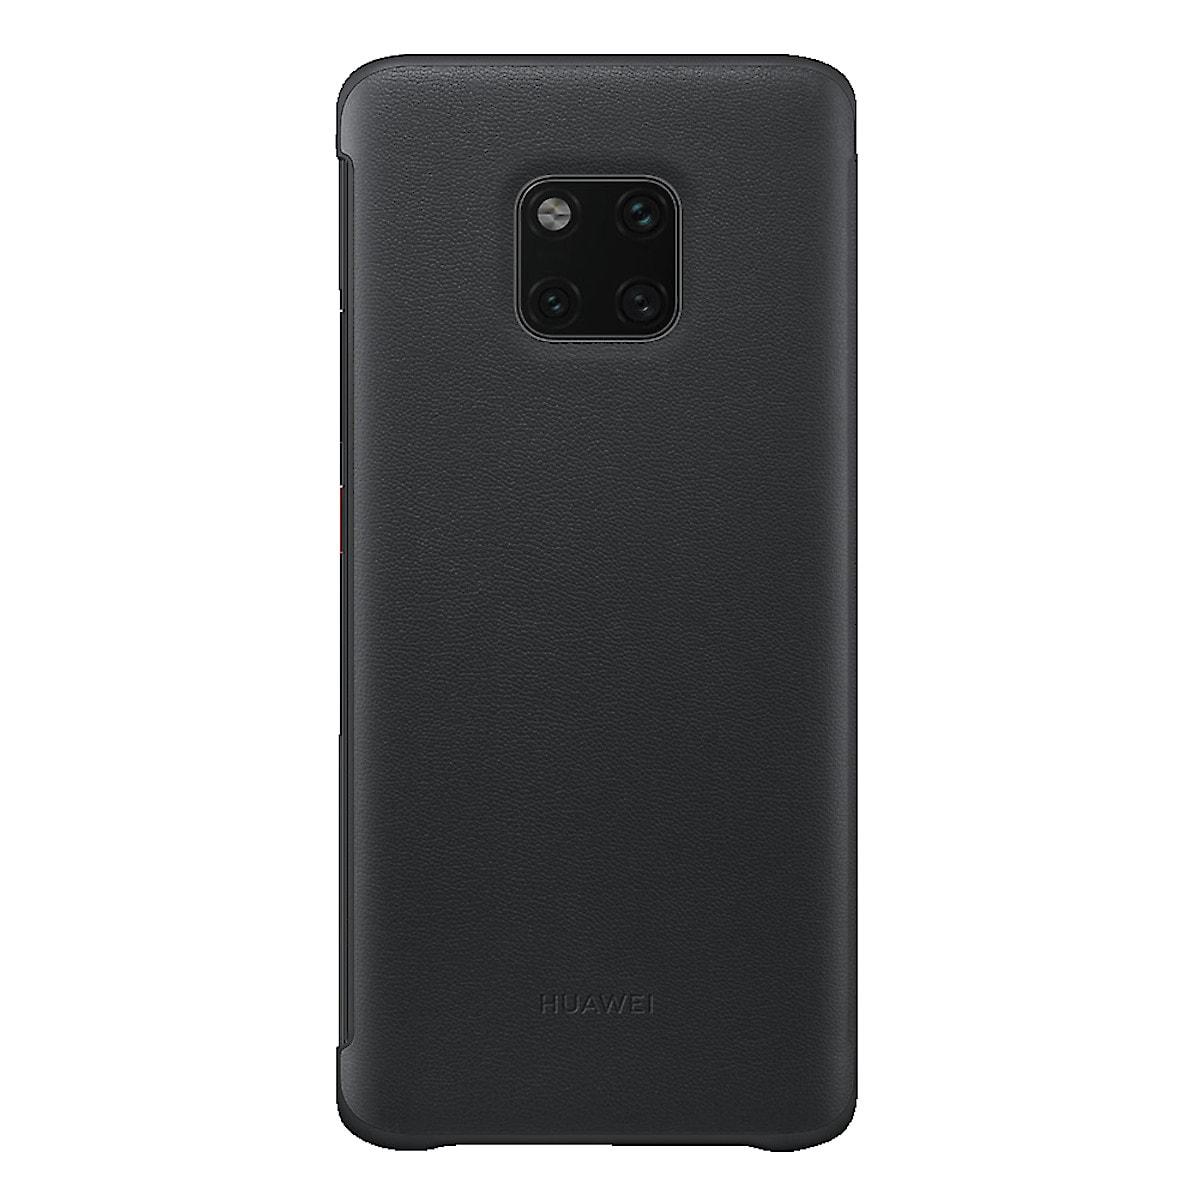 Flipfodral för Huawei Mate 20 Pro, Huawei Smart View